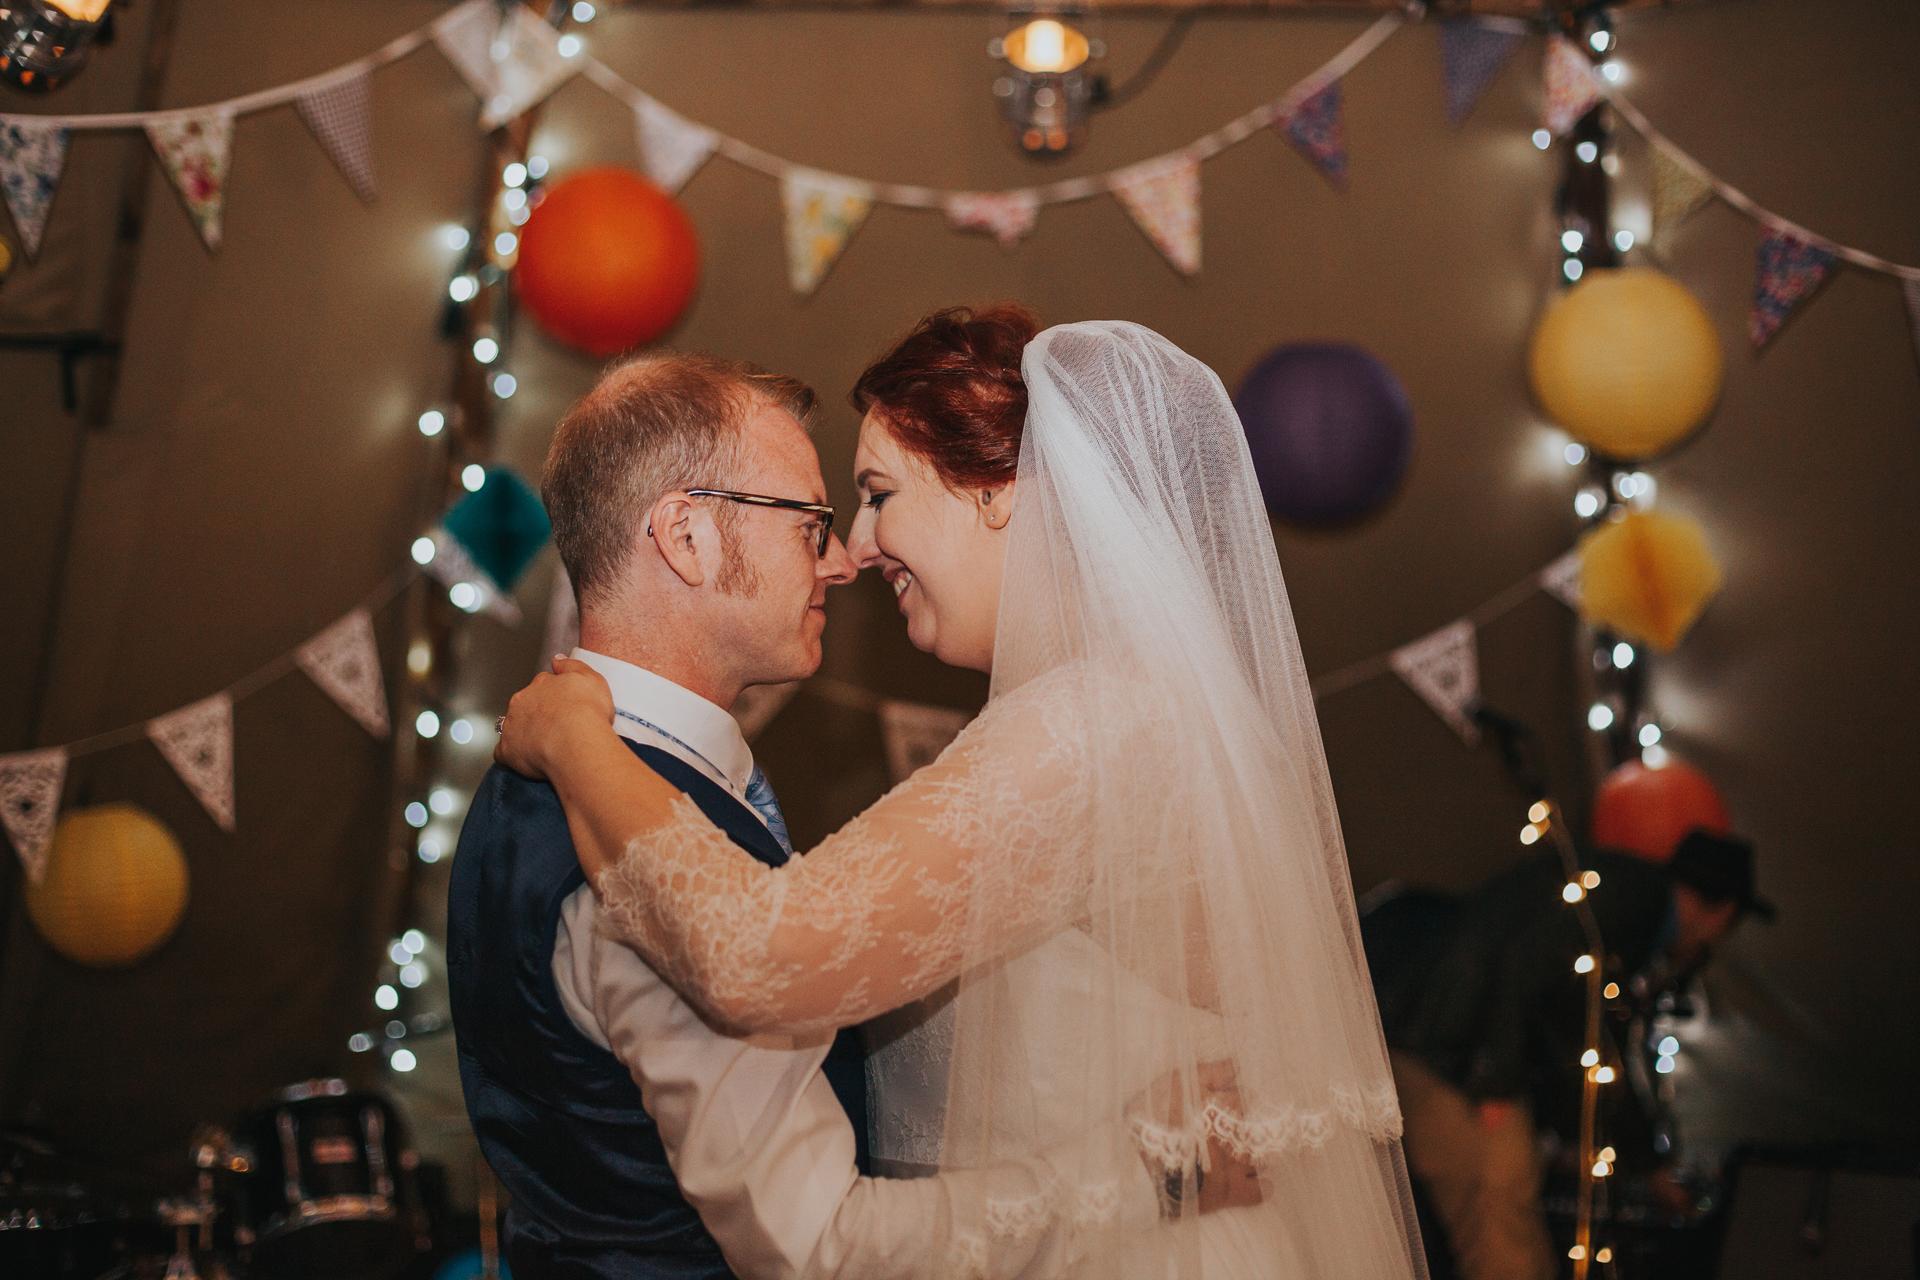 Bride and groom begin first dance.